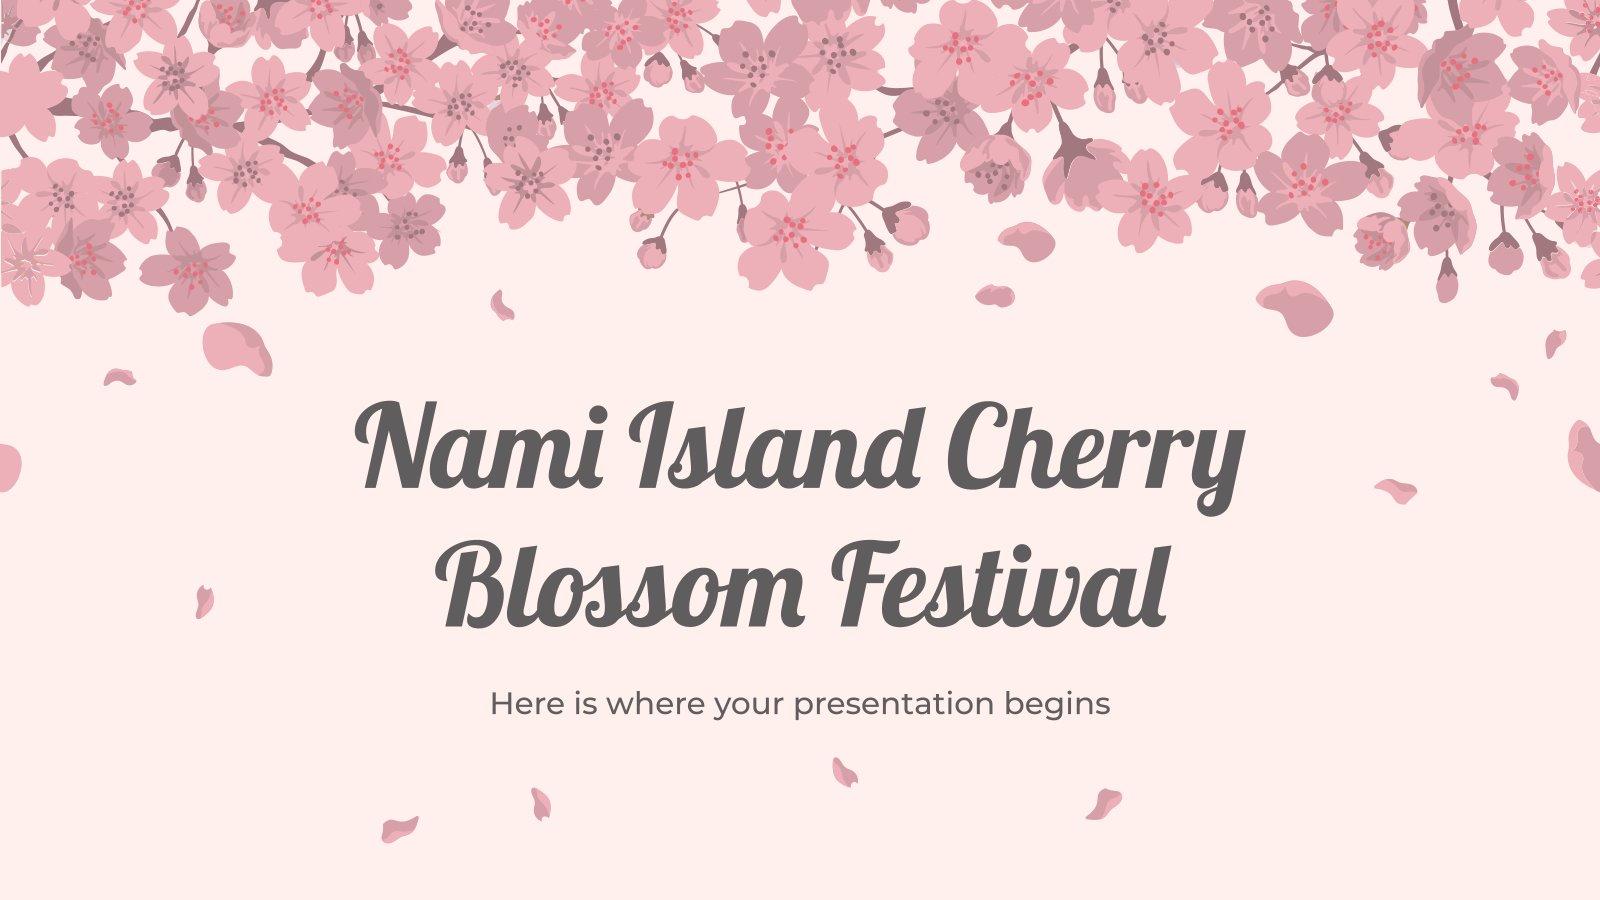 Nami Island Cherry Blossom Festival presentation template